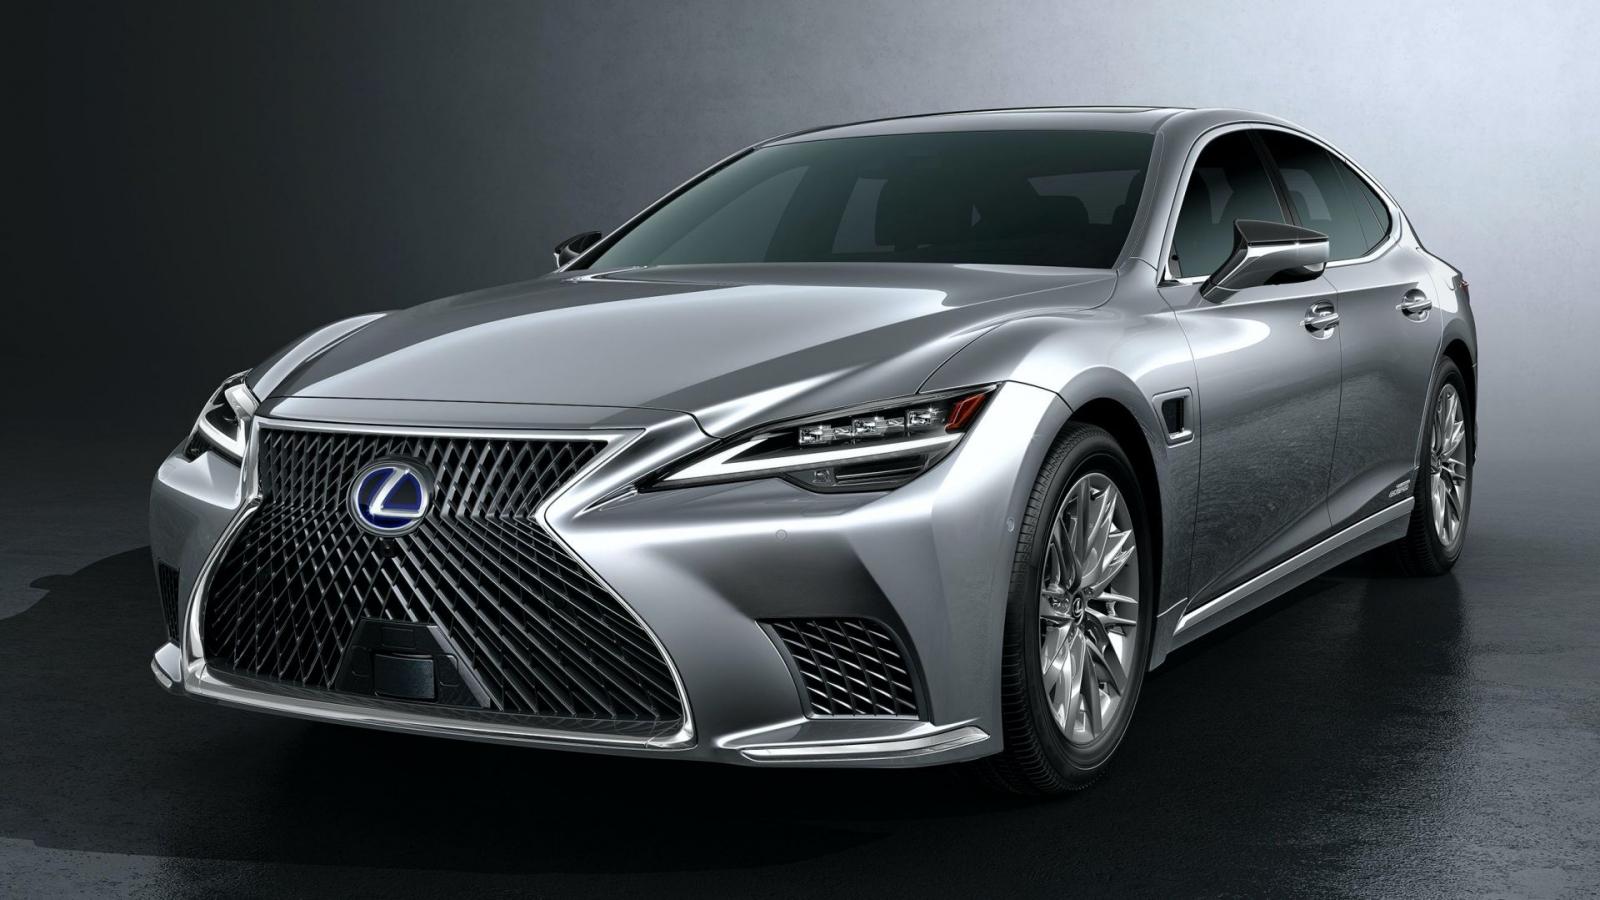 Lexus LS 500h hybrid 2021 tăng giá hơn 10.000 USD